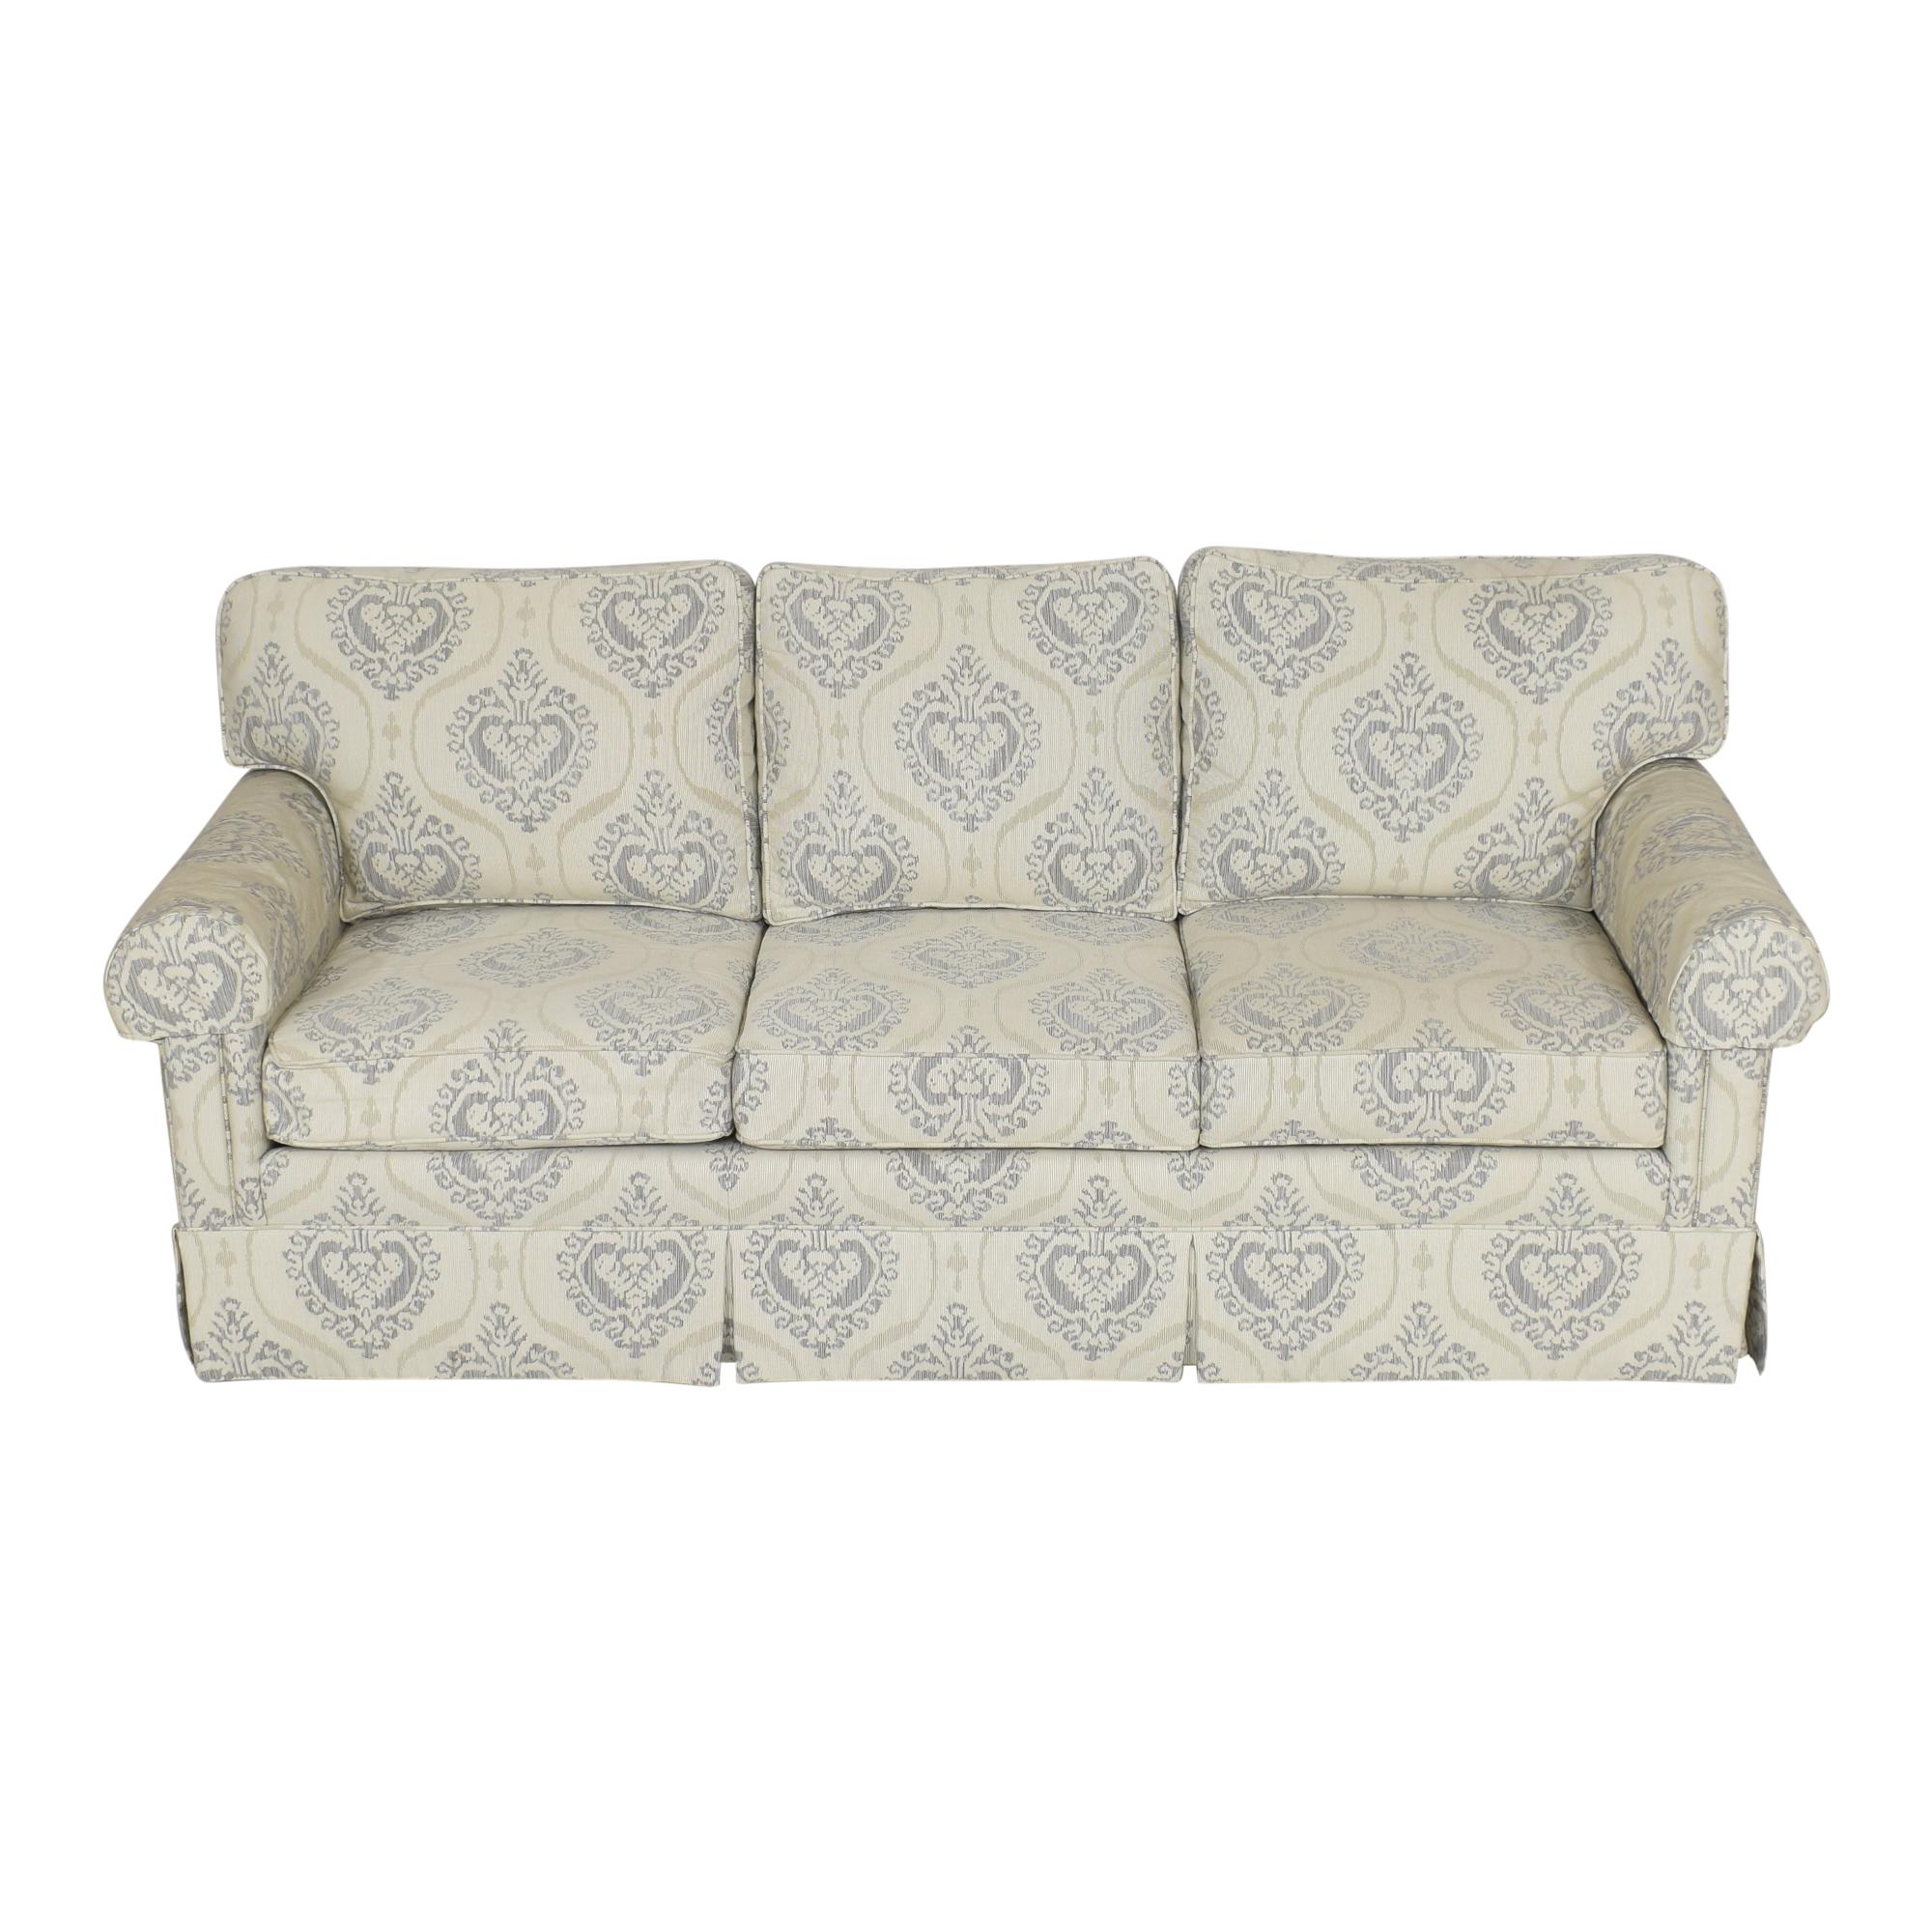 buy Ethan Allen Three Cushion Skirted Sofa Ethan Allen Classic Sofas